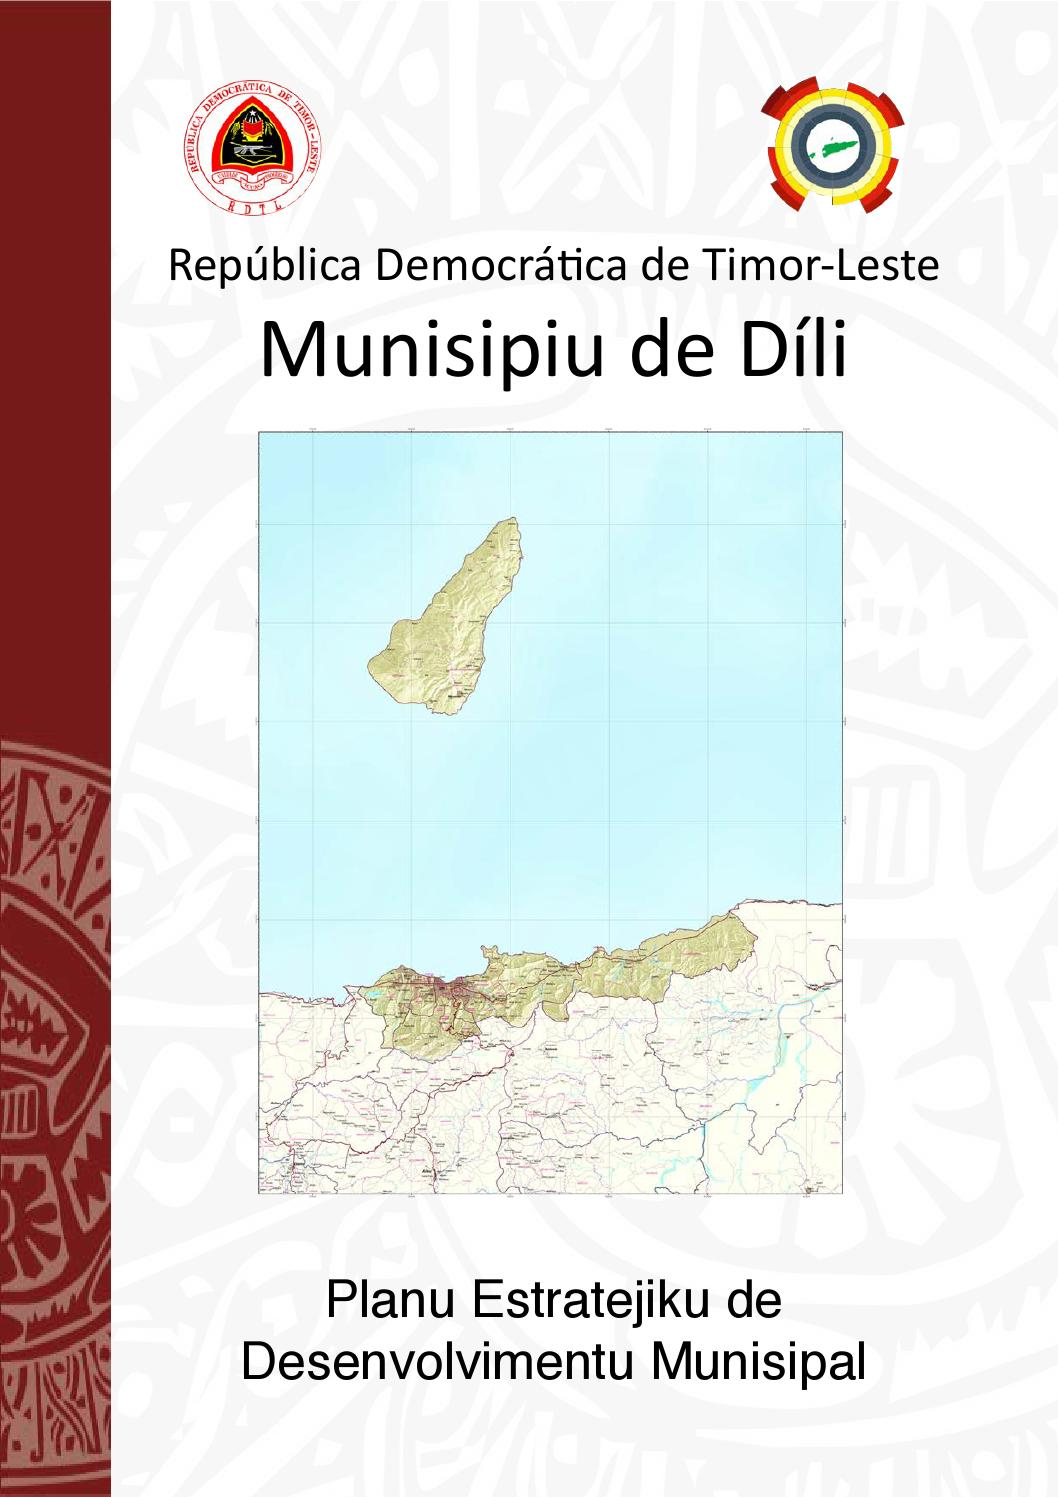 Aeroporto Dili : Pedm díli by desentralizasaun issuu